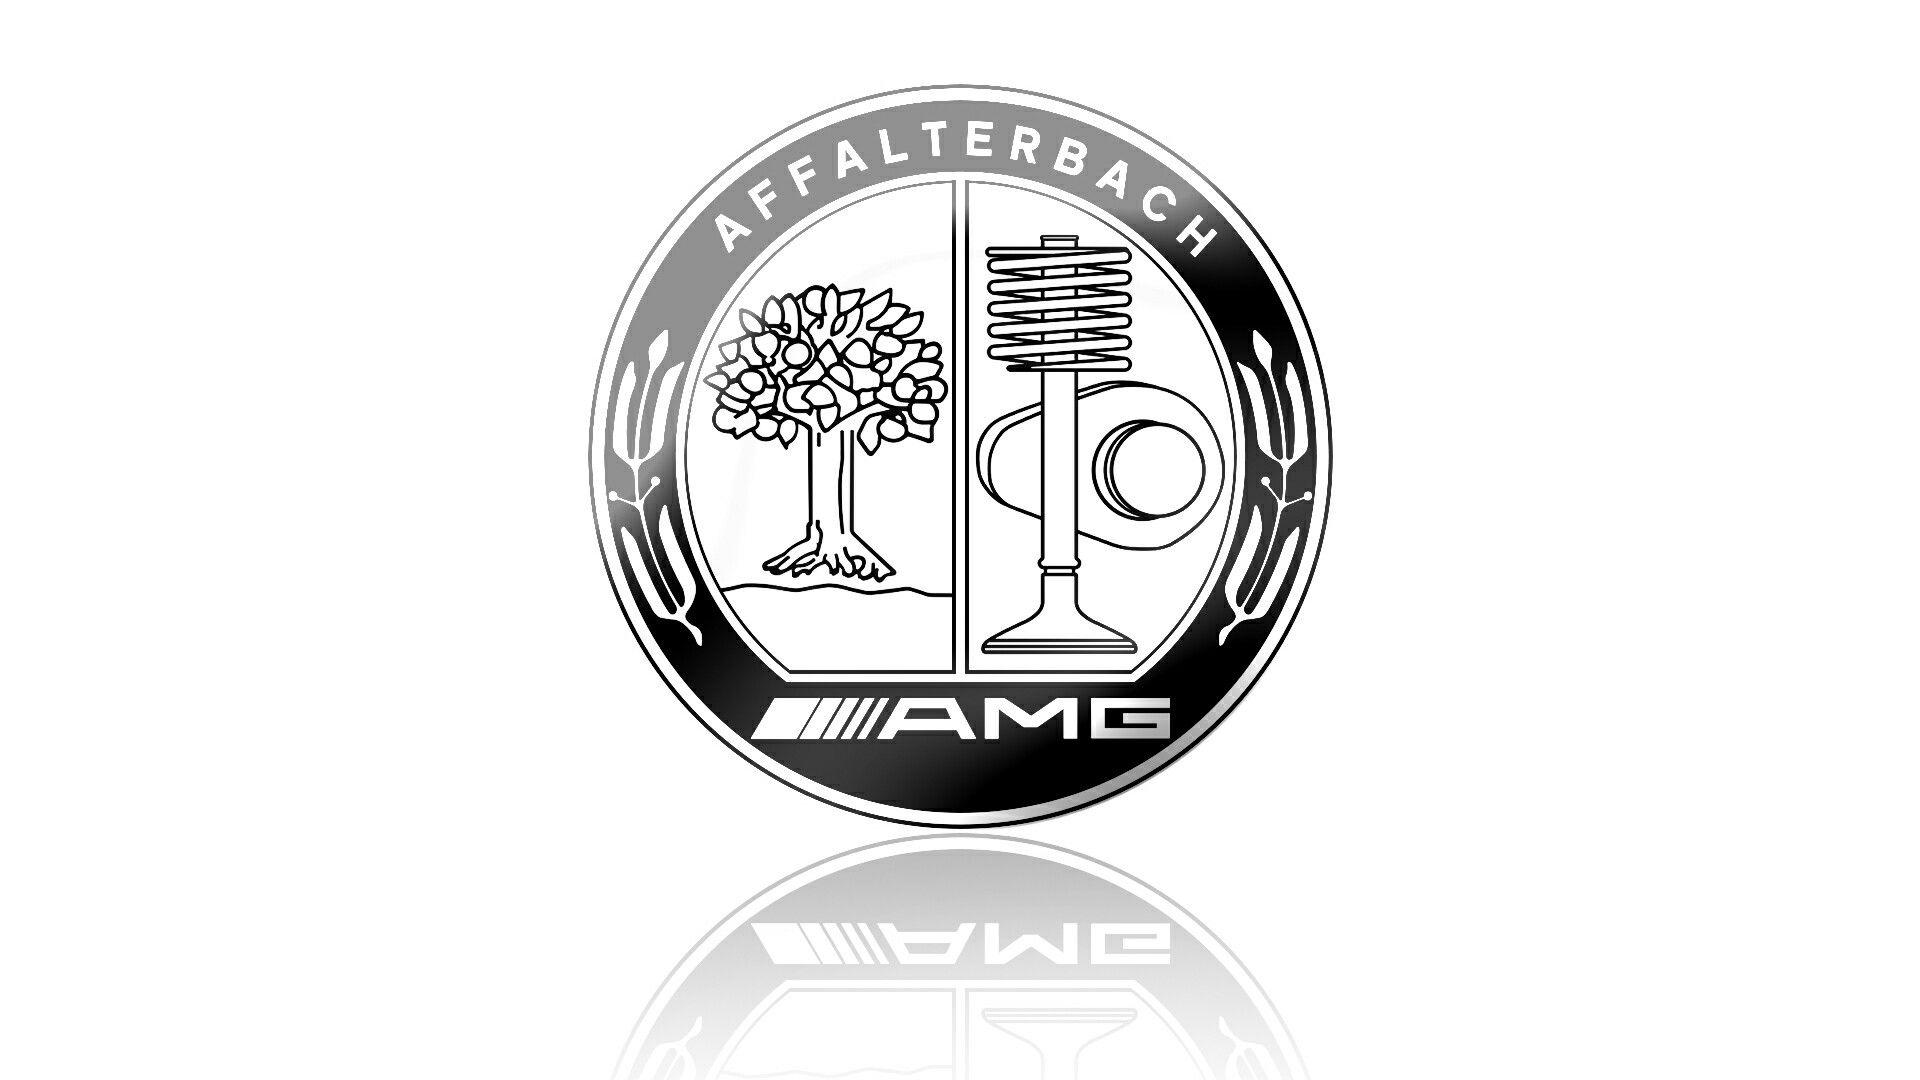 AMG Logo | メルセデス, Iphone 用壁紙, 壁紙